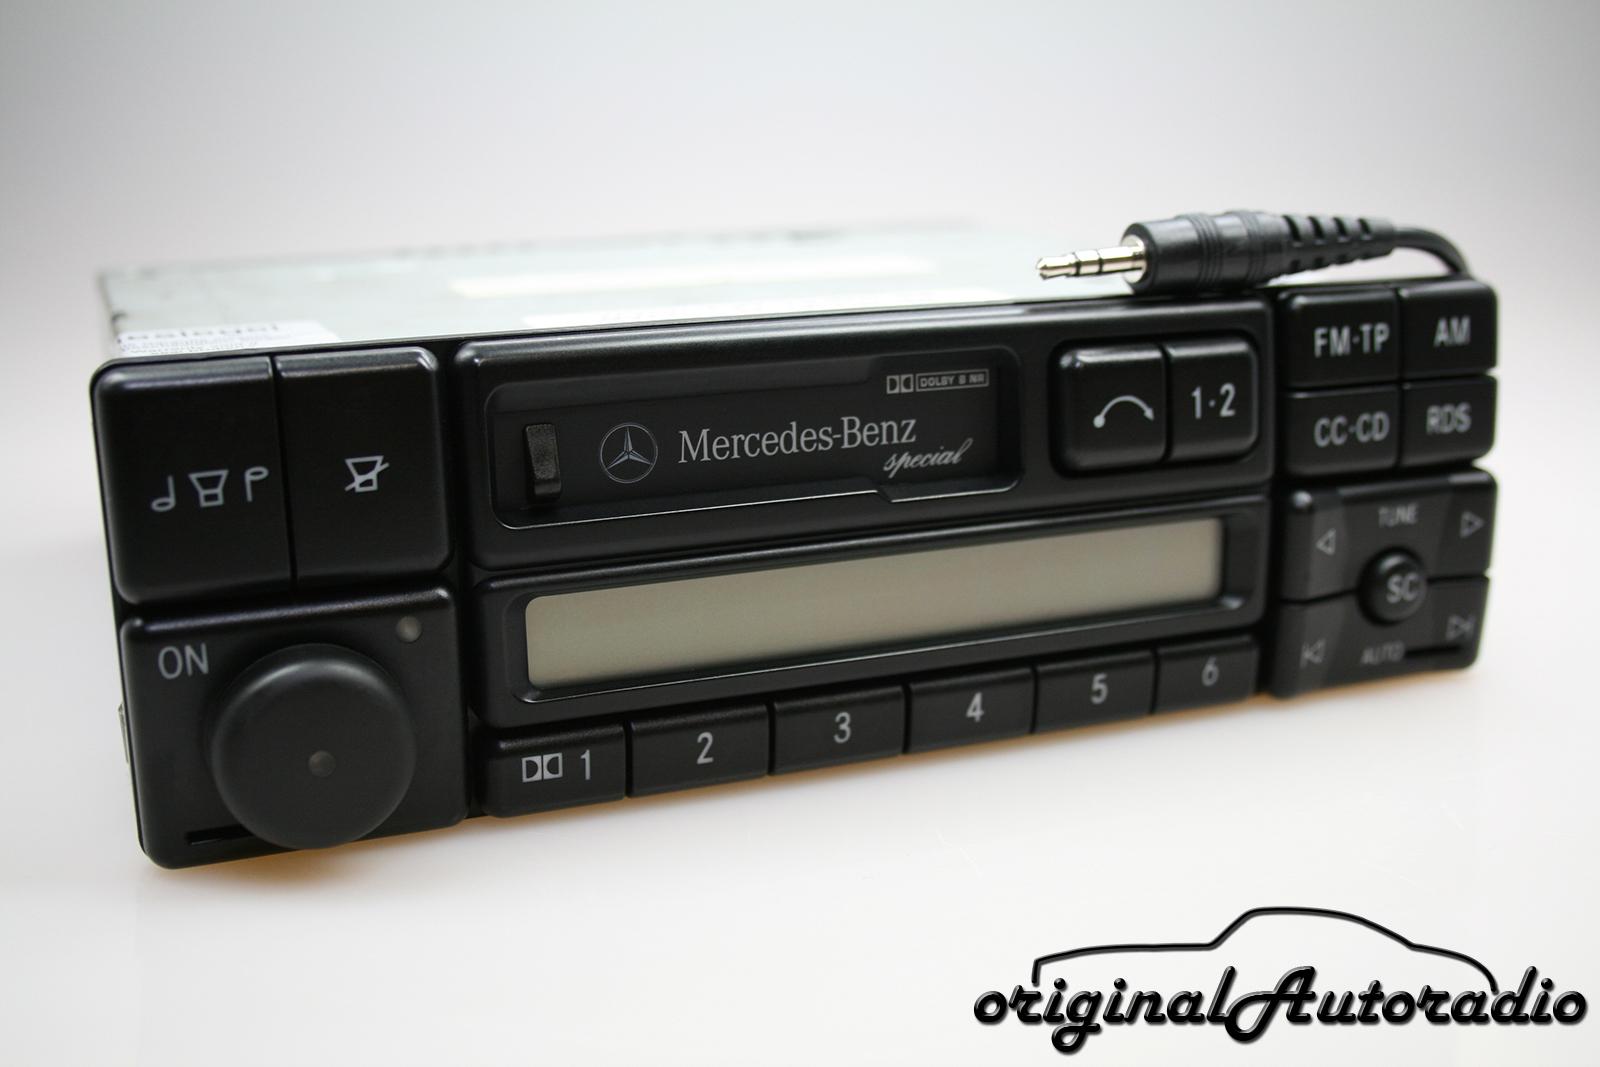 Original-Autoradio.de - Mercedes Special BE1650 CC AUX-IN Becker ...